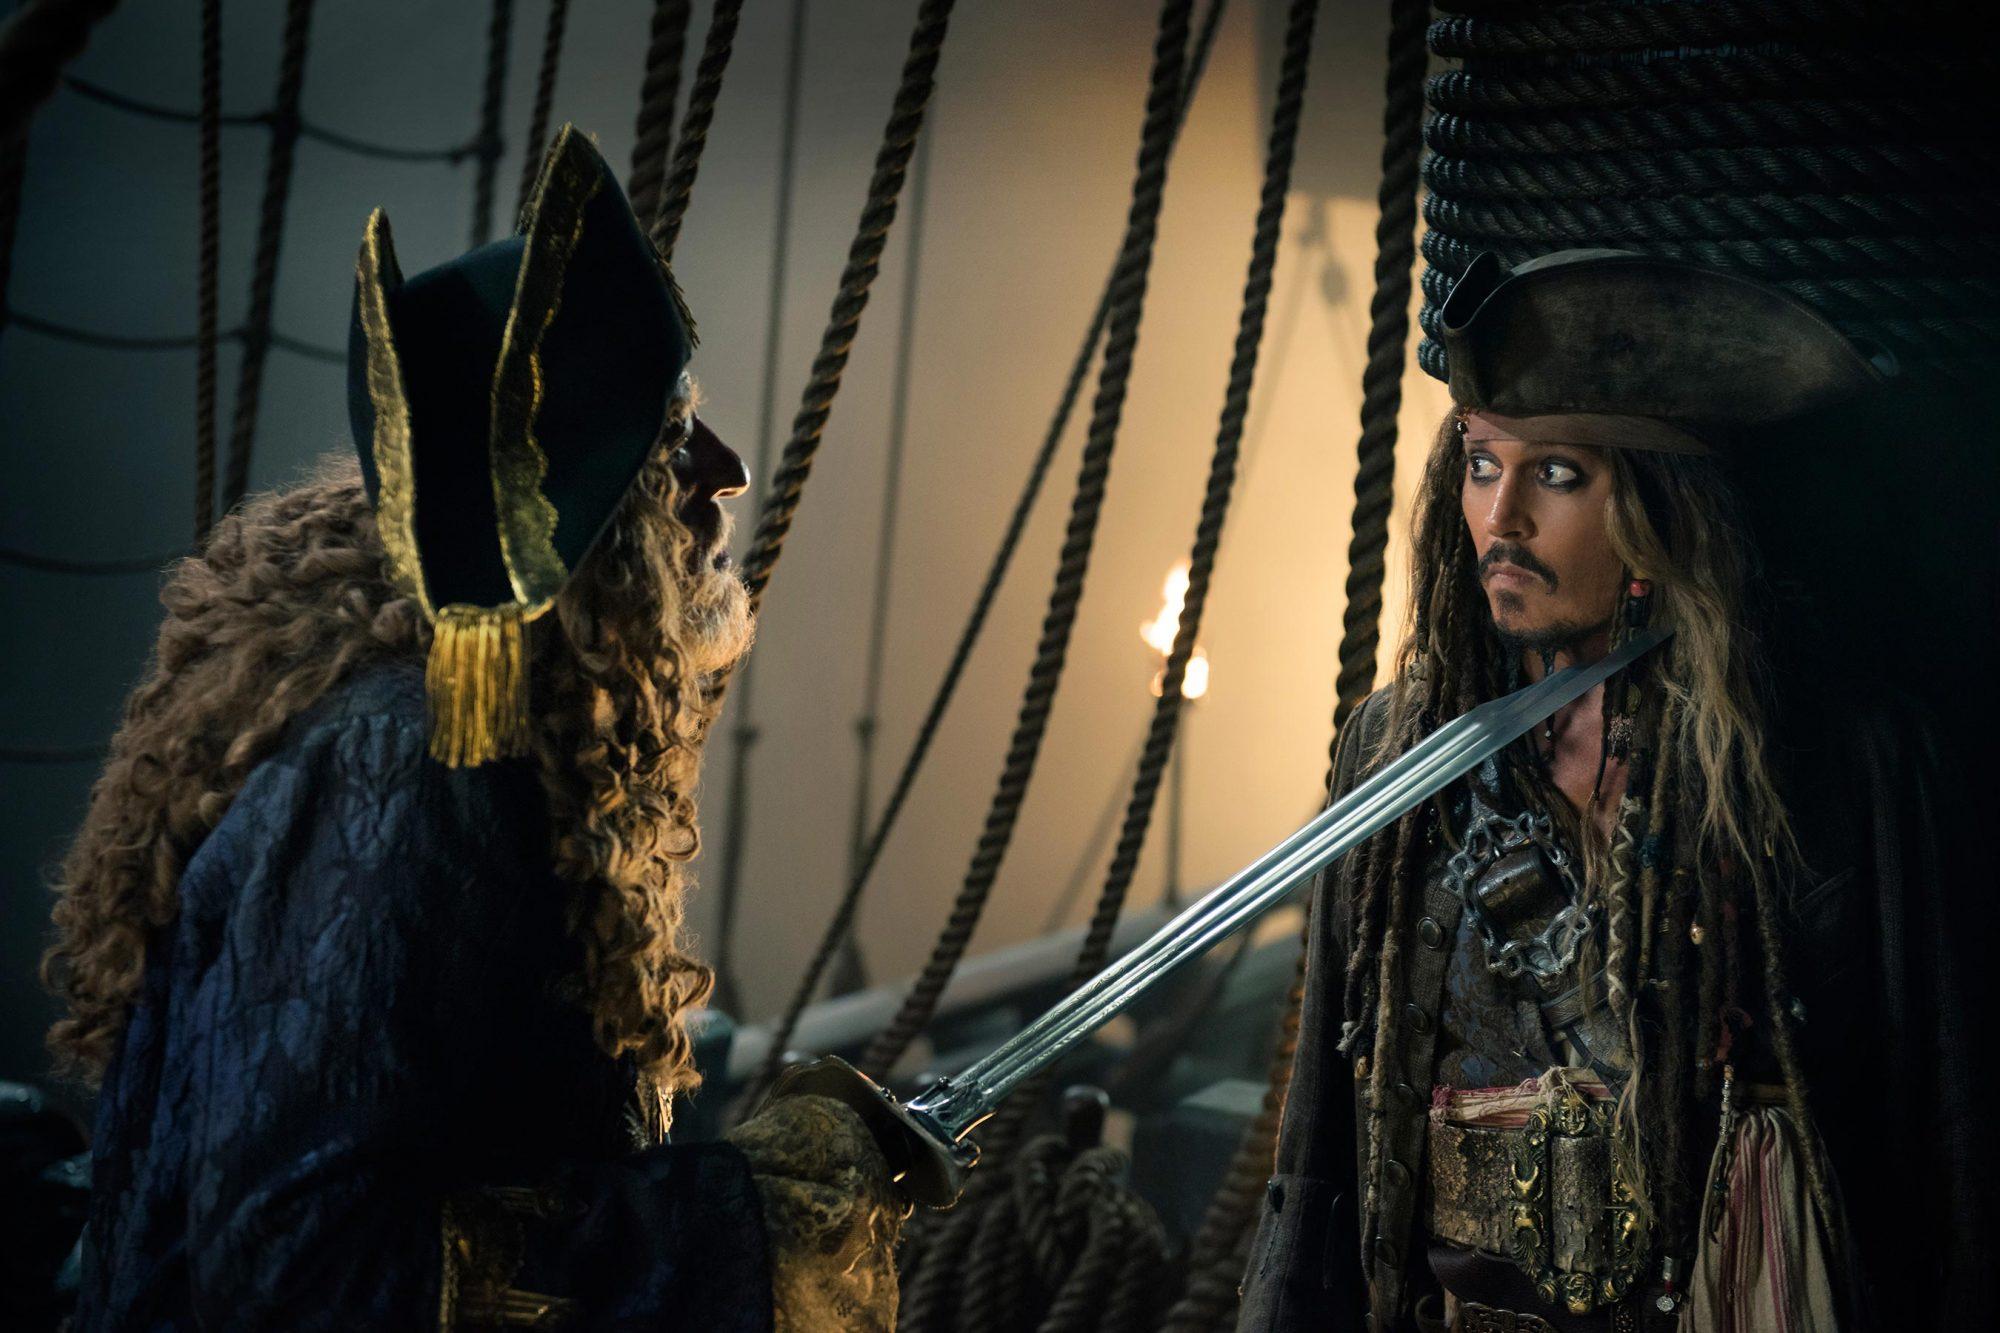 5. Captain Barbossa (Pirates of the Caribbean: Dead Men Tell No Tales)